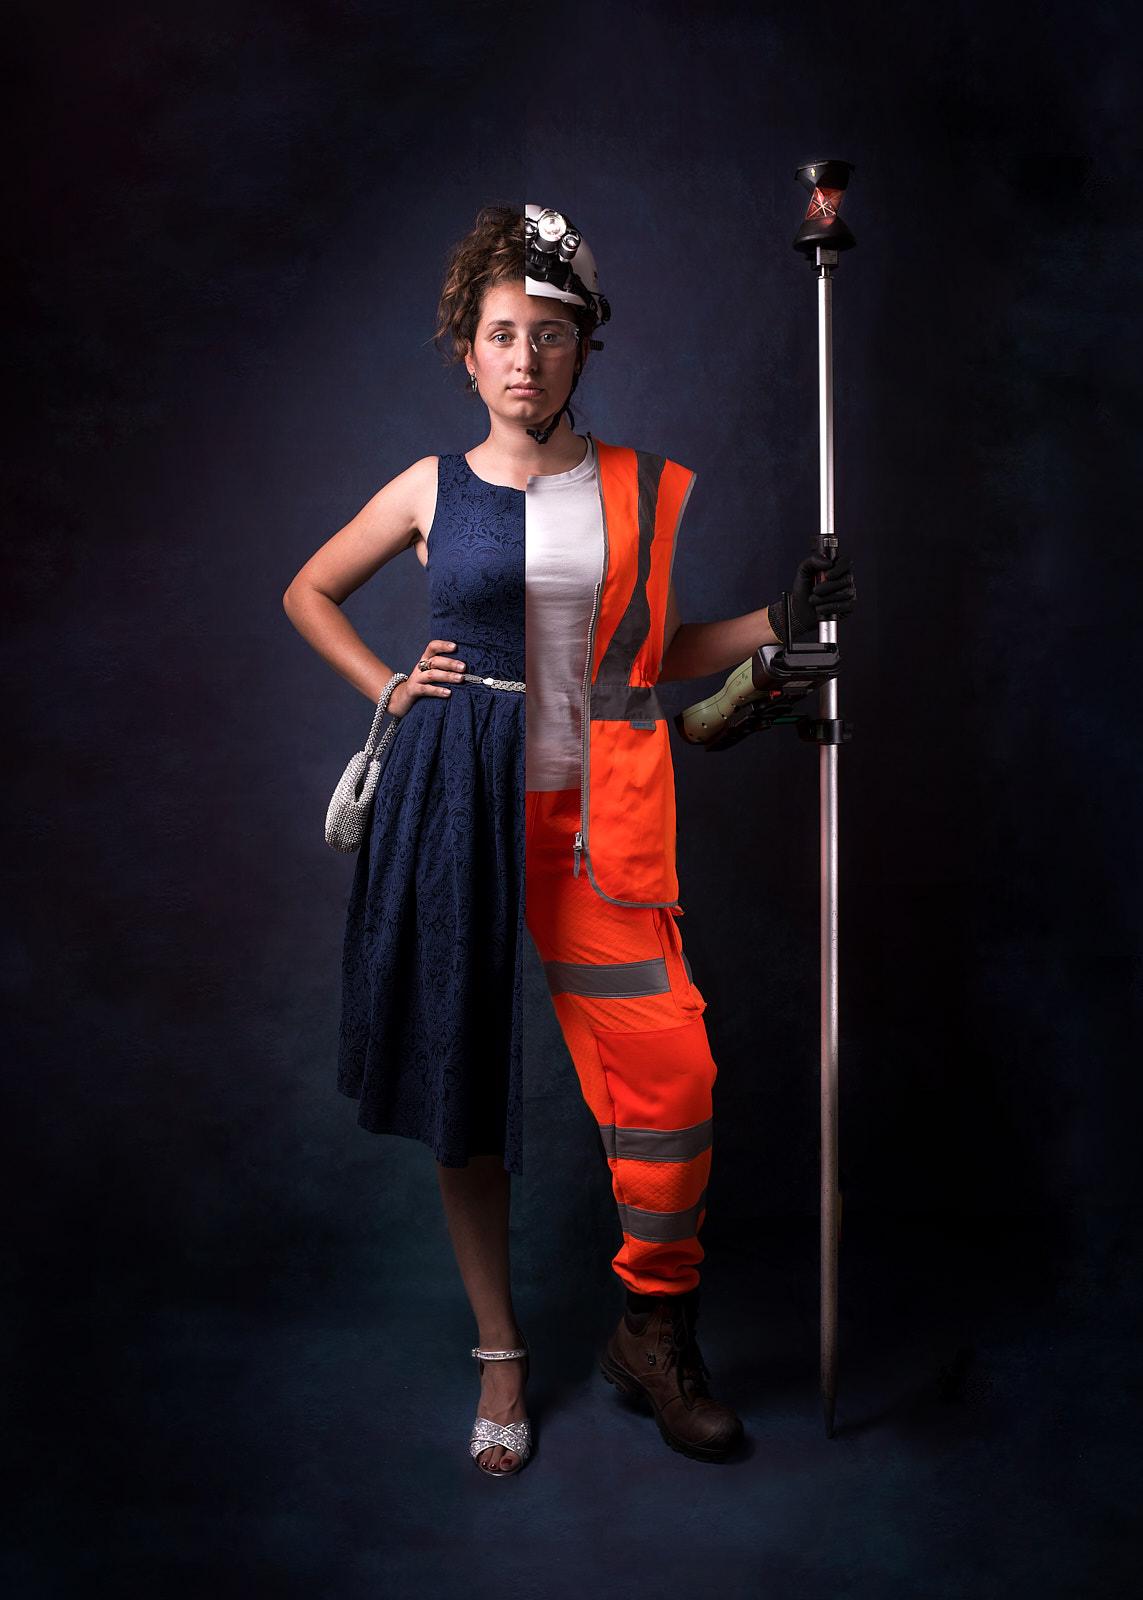 Woman surveyor creative photography